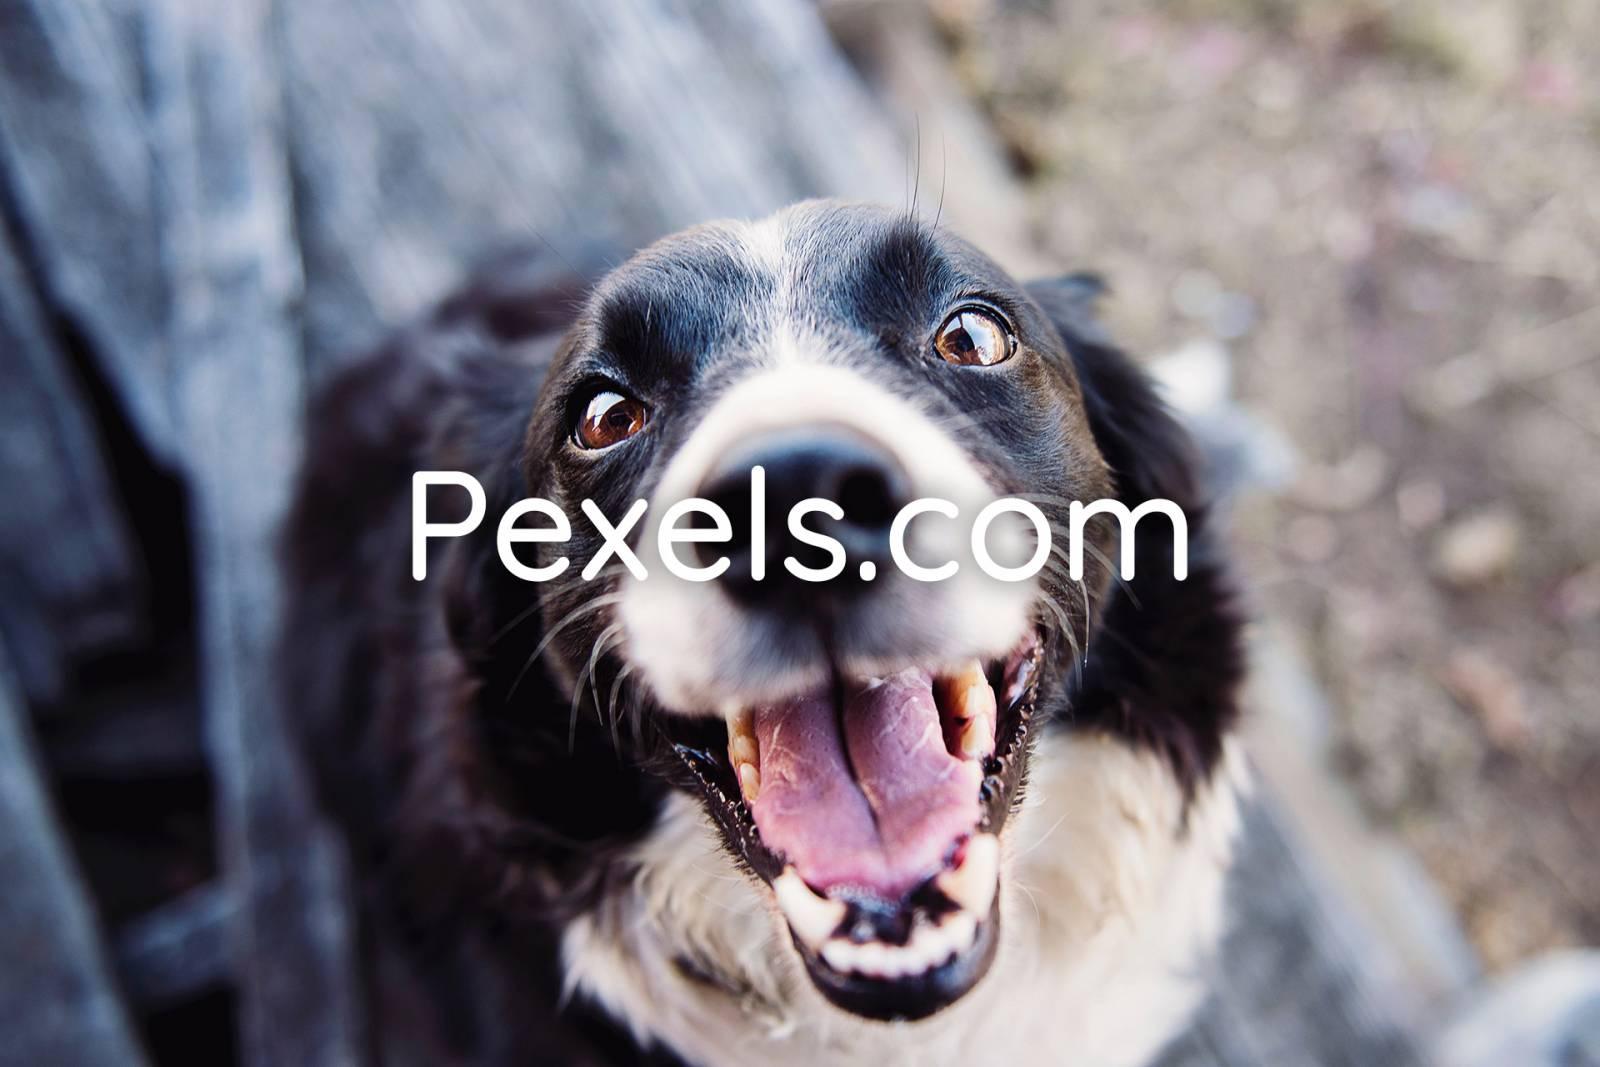 pexels gratis stockfoto's